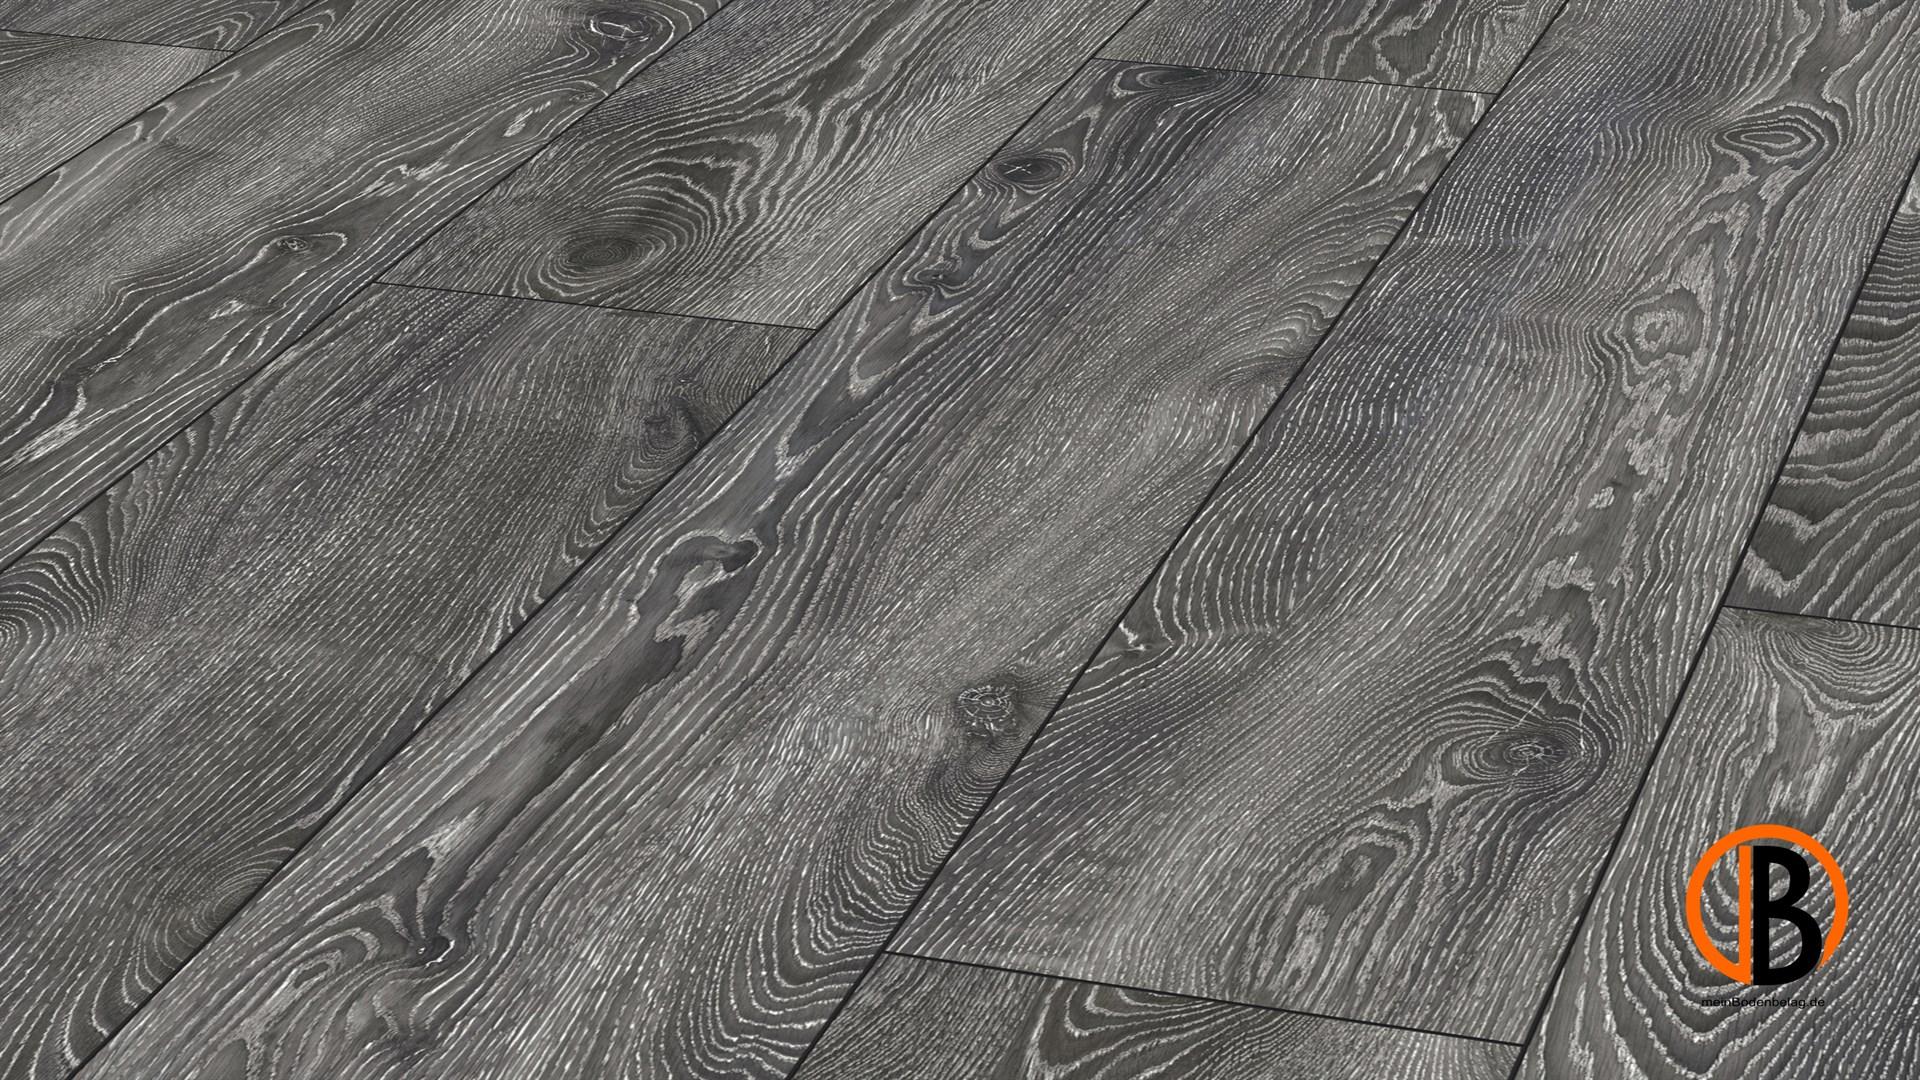 CINQUE KRONOTEX LAMINAT MAMMUT PLUS | 10003560;0 | Bild 1